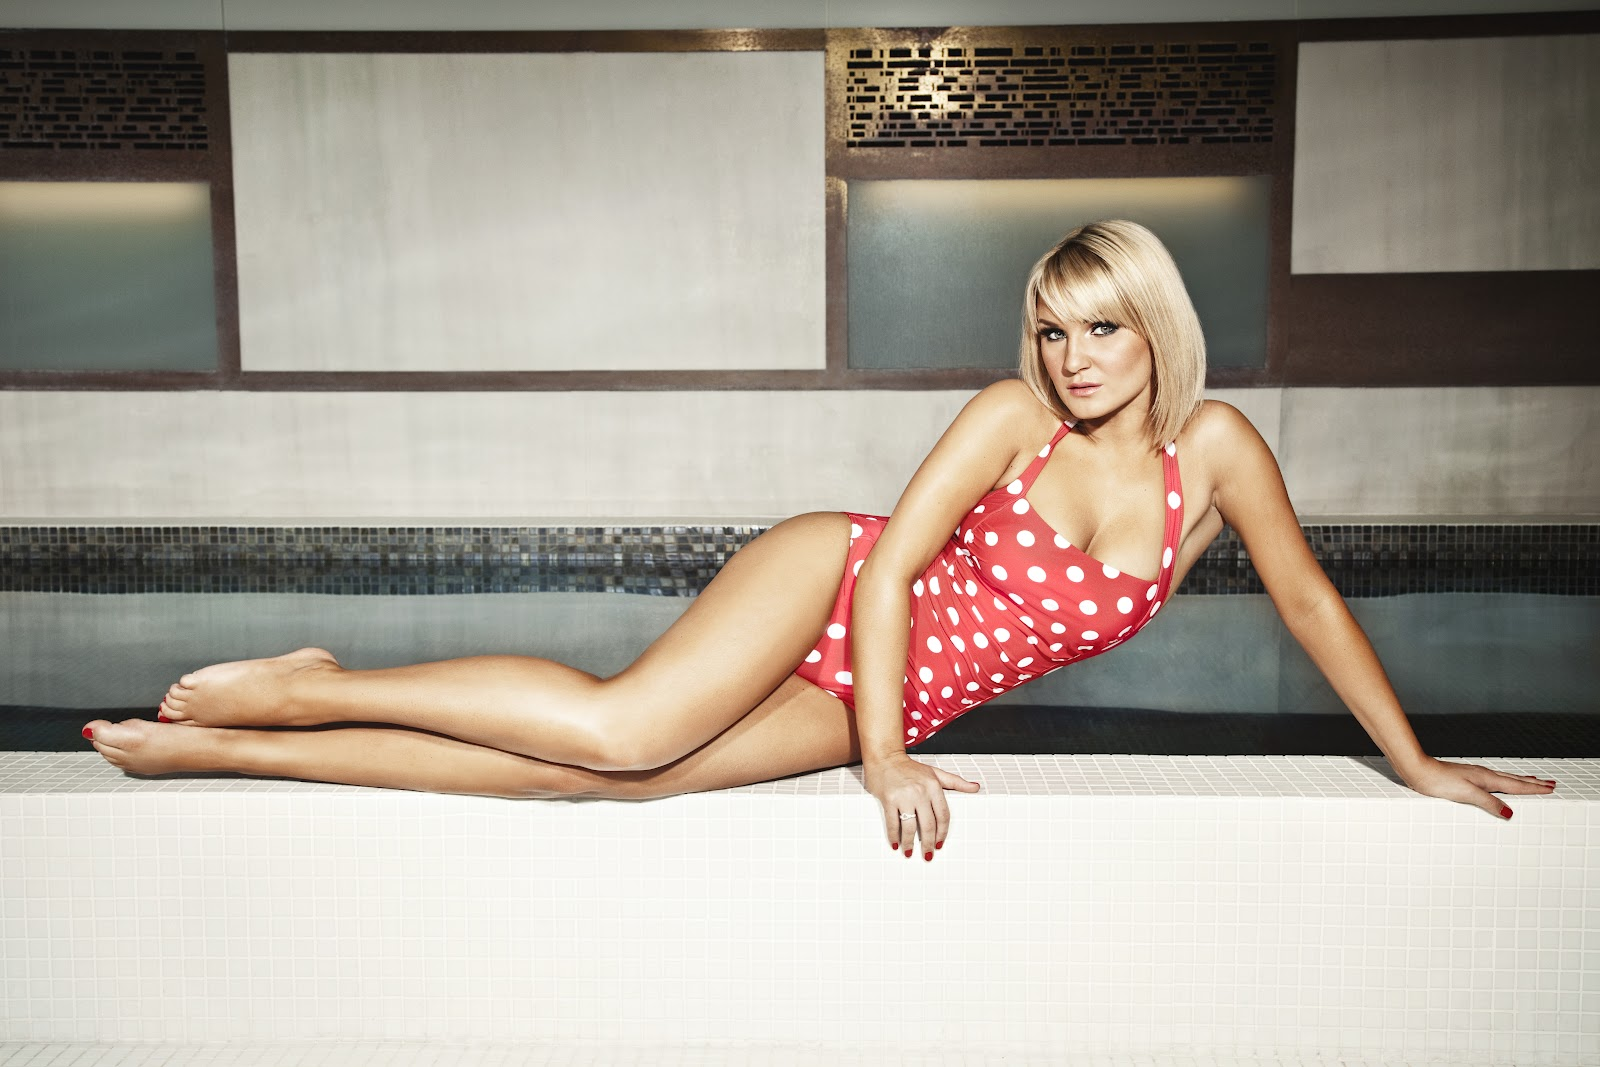 b0e814385a6 Undercover Lingerista - Lingerie blog: Swimwear365 launch with Sam ...